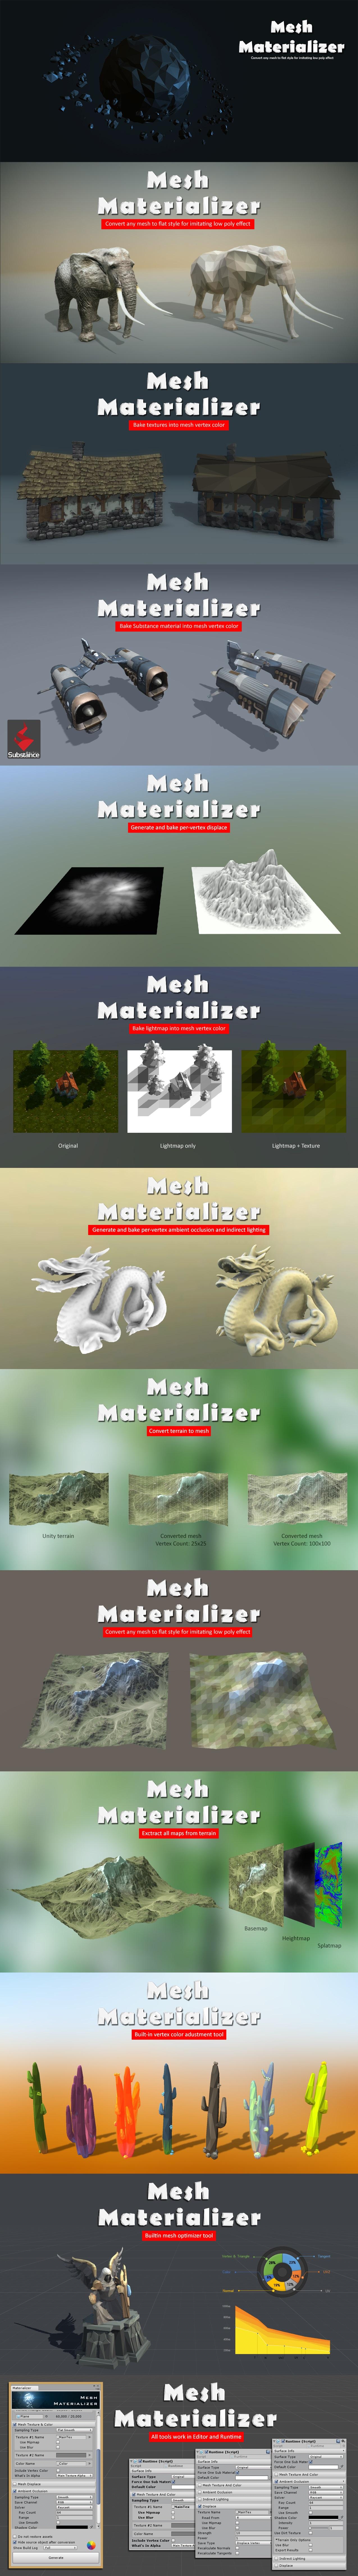 mesh-materializer-posters.jpg